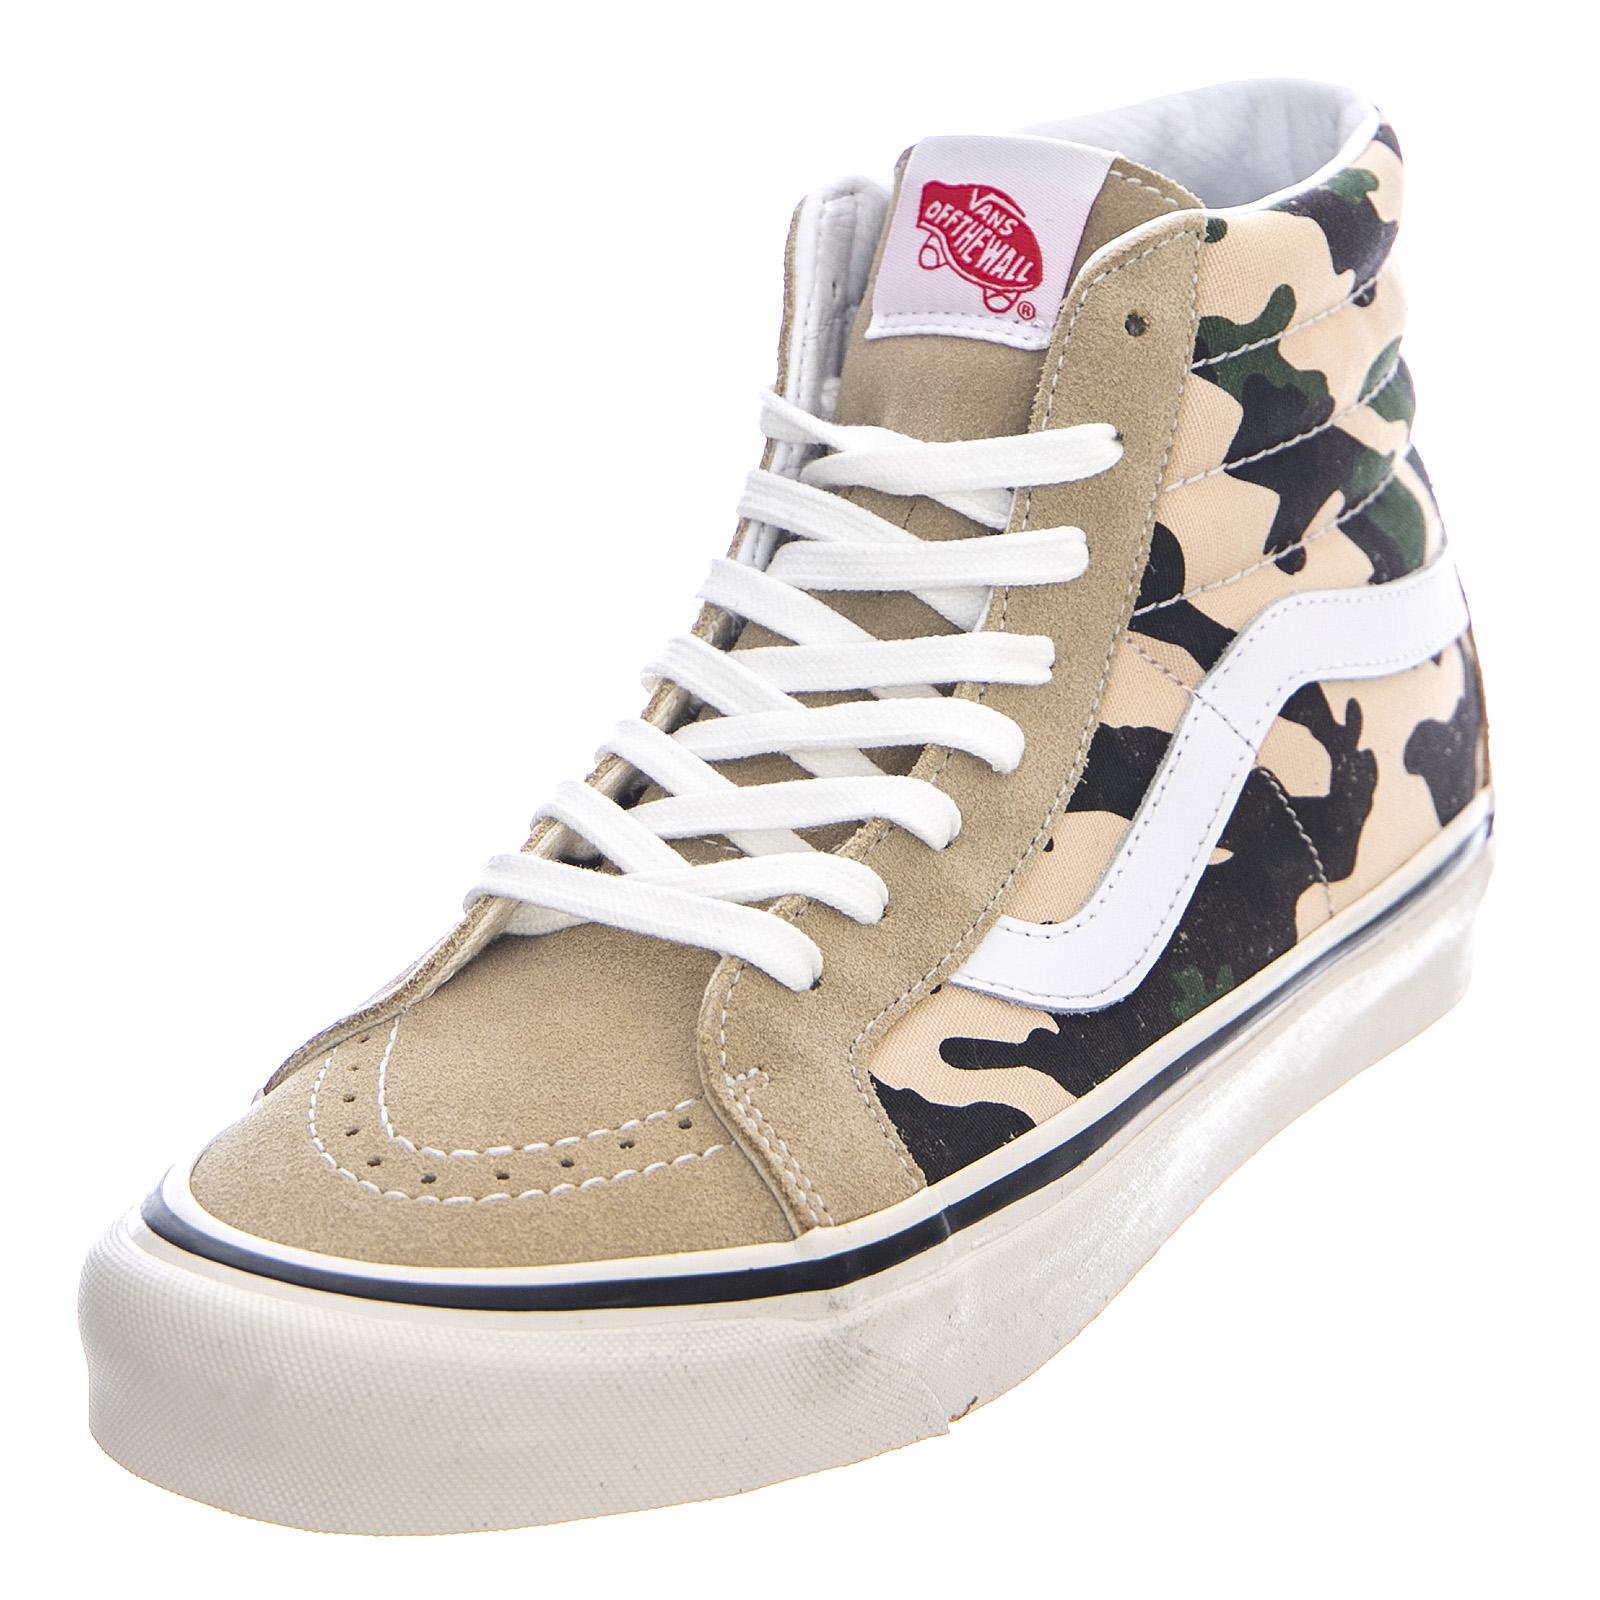 Details about Vans Anaheim Factory sk8 hi 38 Dx Og Khaki Og Camo Shoes High Man Camo